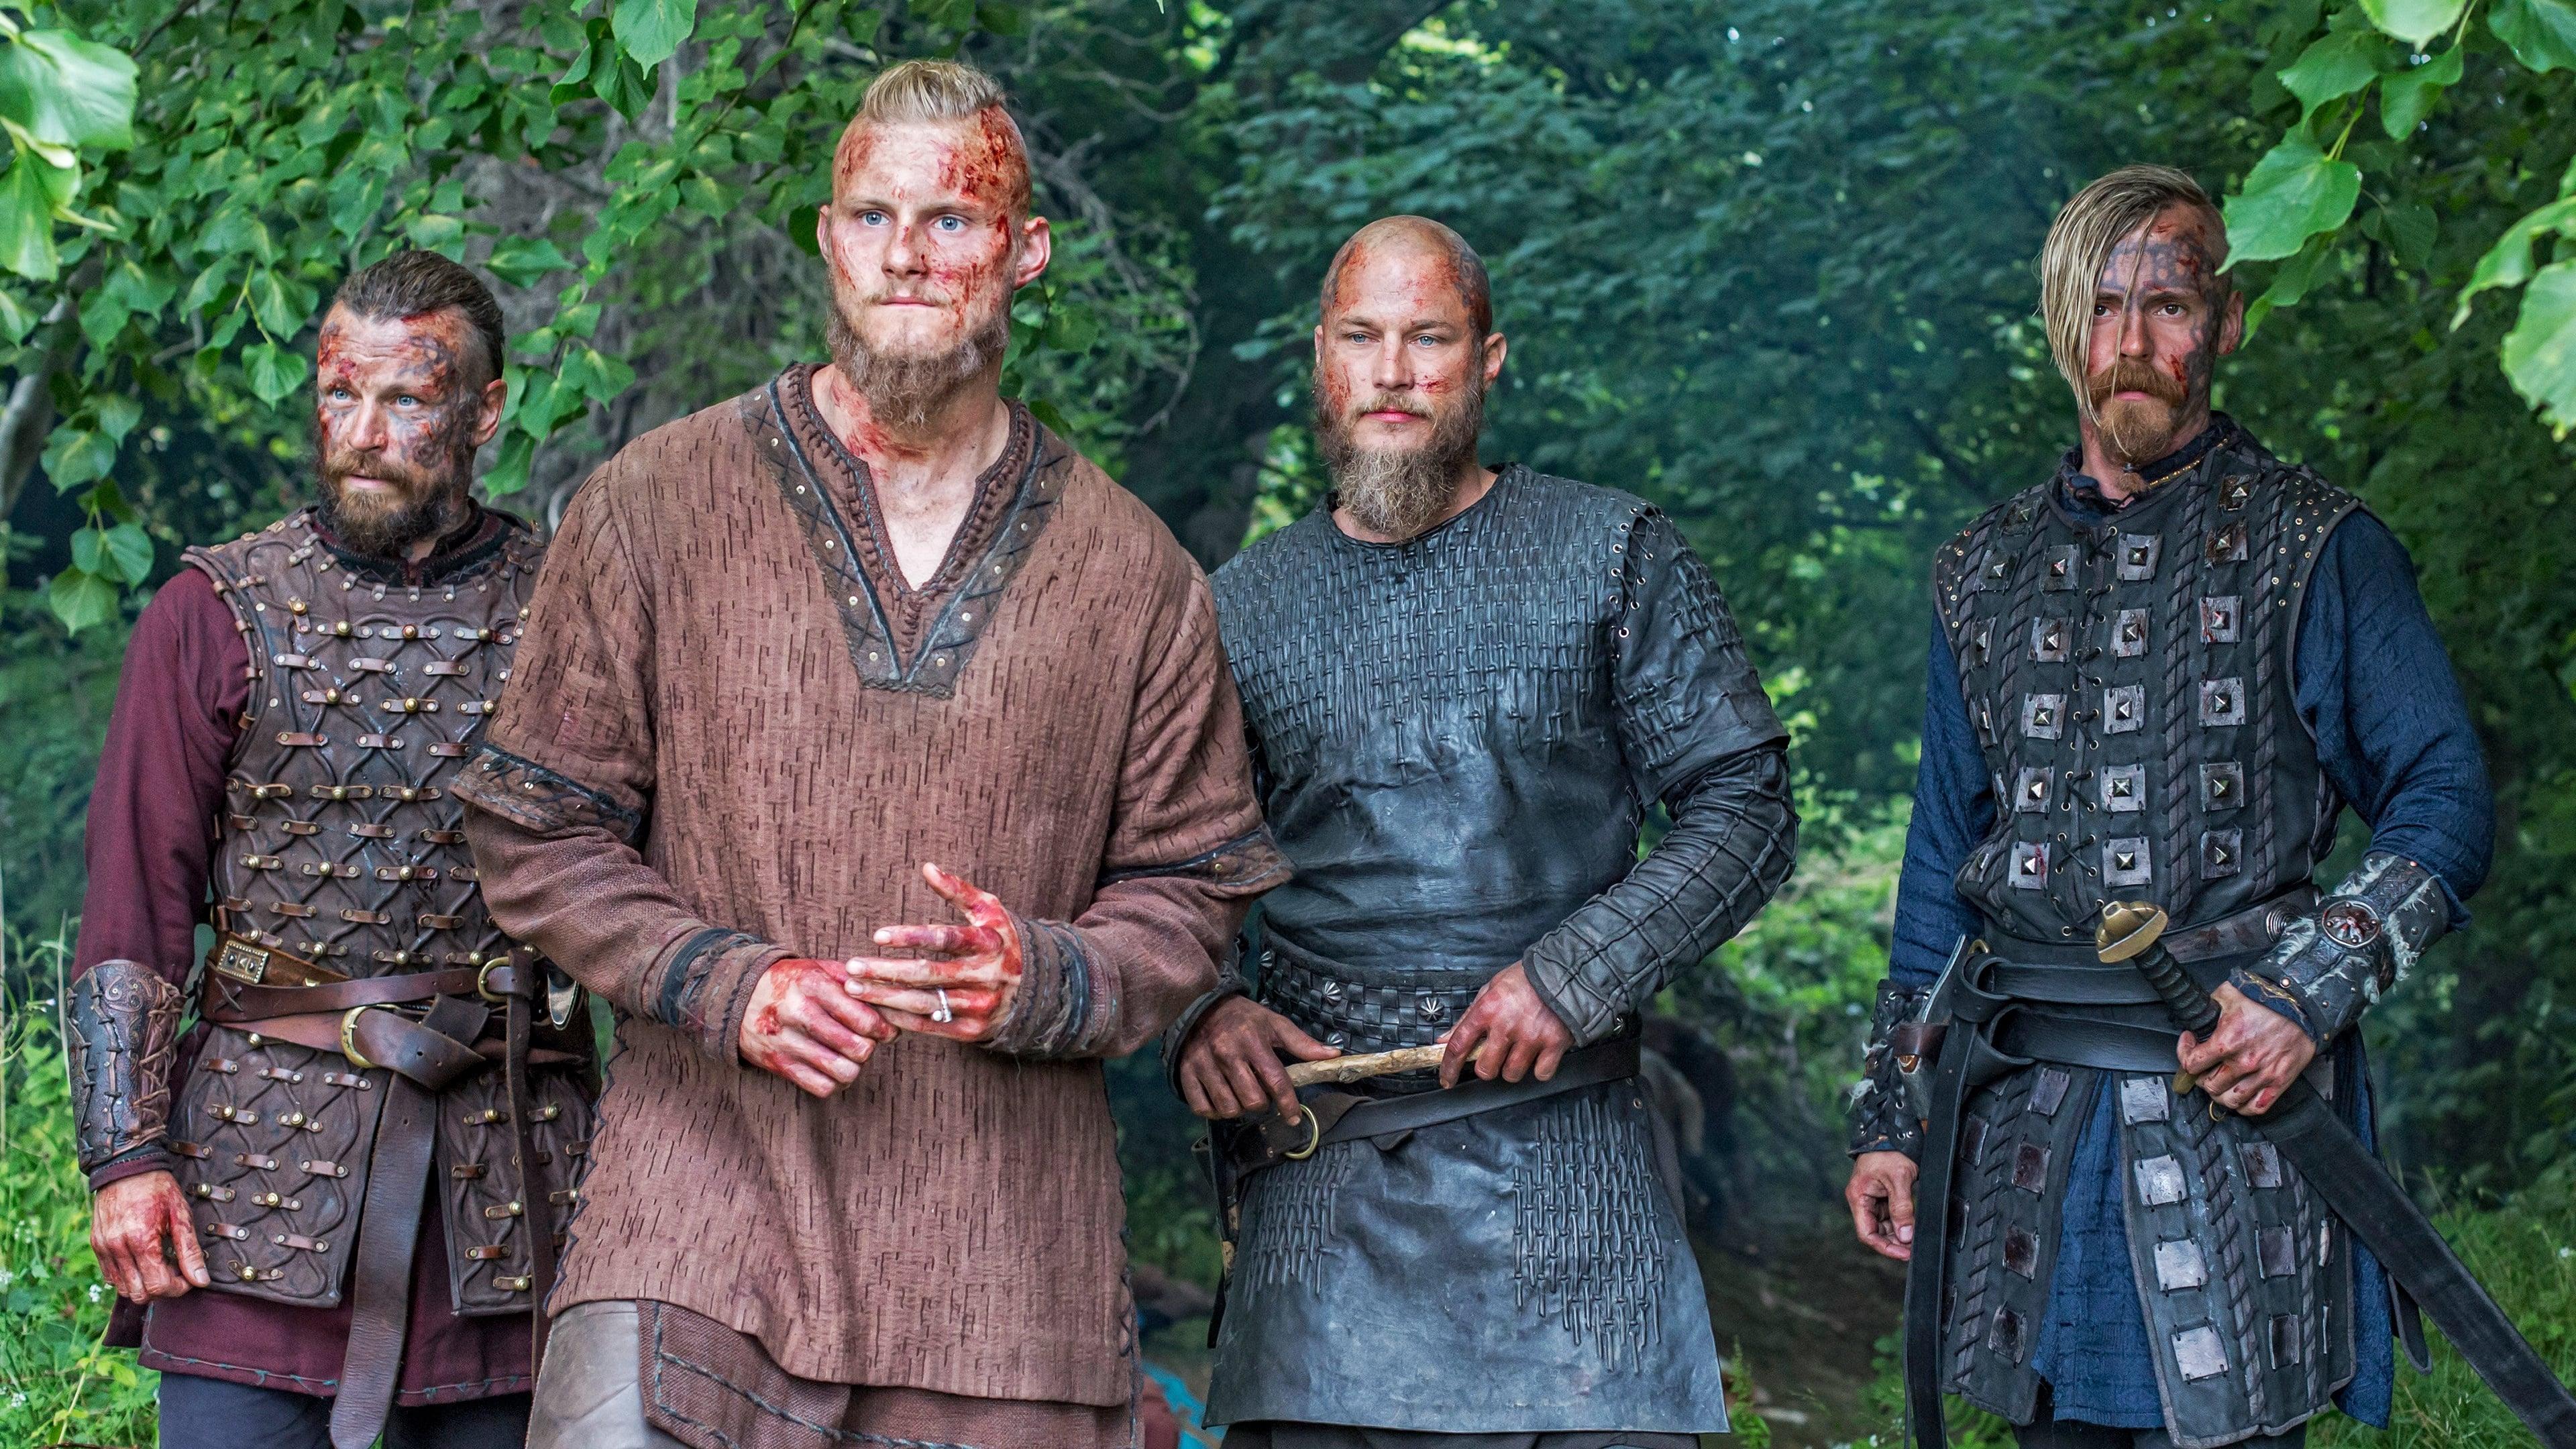 vikingos temporada 6 online